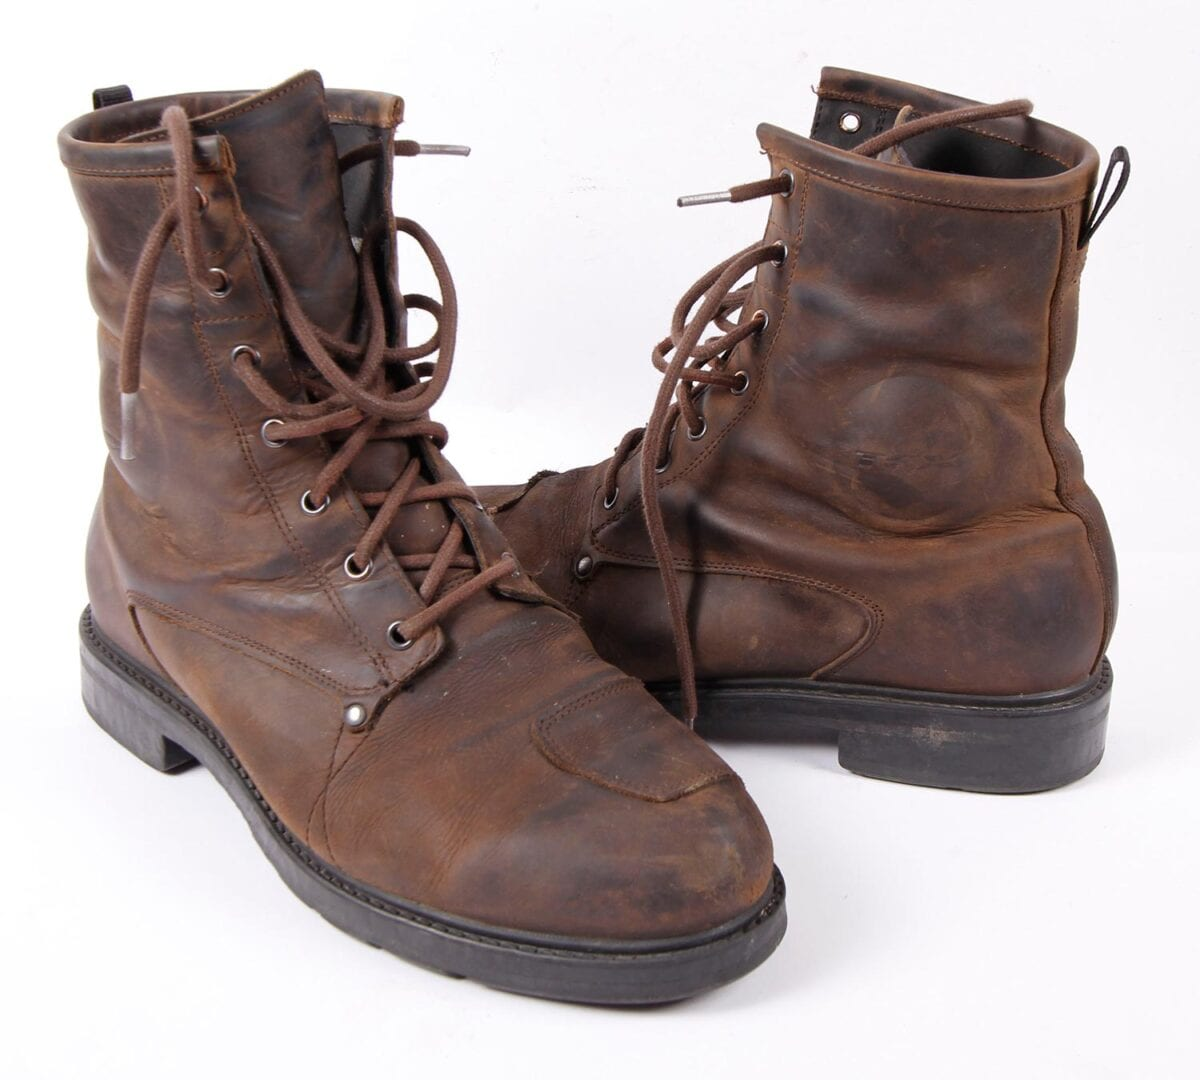 102_TCX-XBlend-boots_003